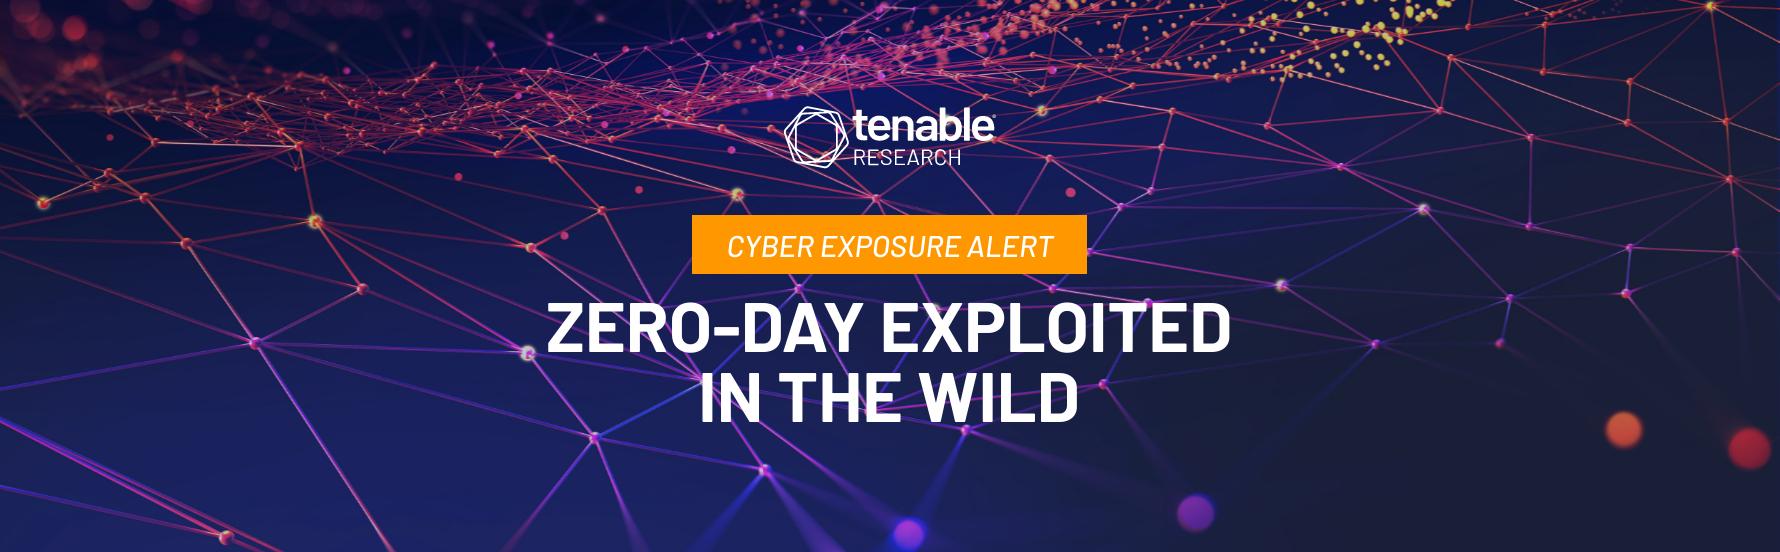 CVE-2021-35211: SolarWinds Serv-U Managed File Transfer Zero-Day Vulnerability Exploited in Targeted Attacks